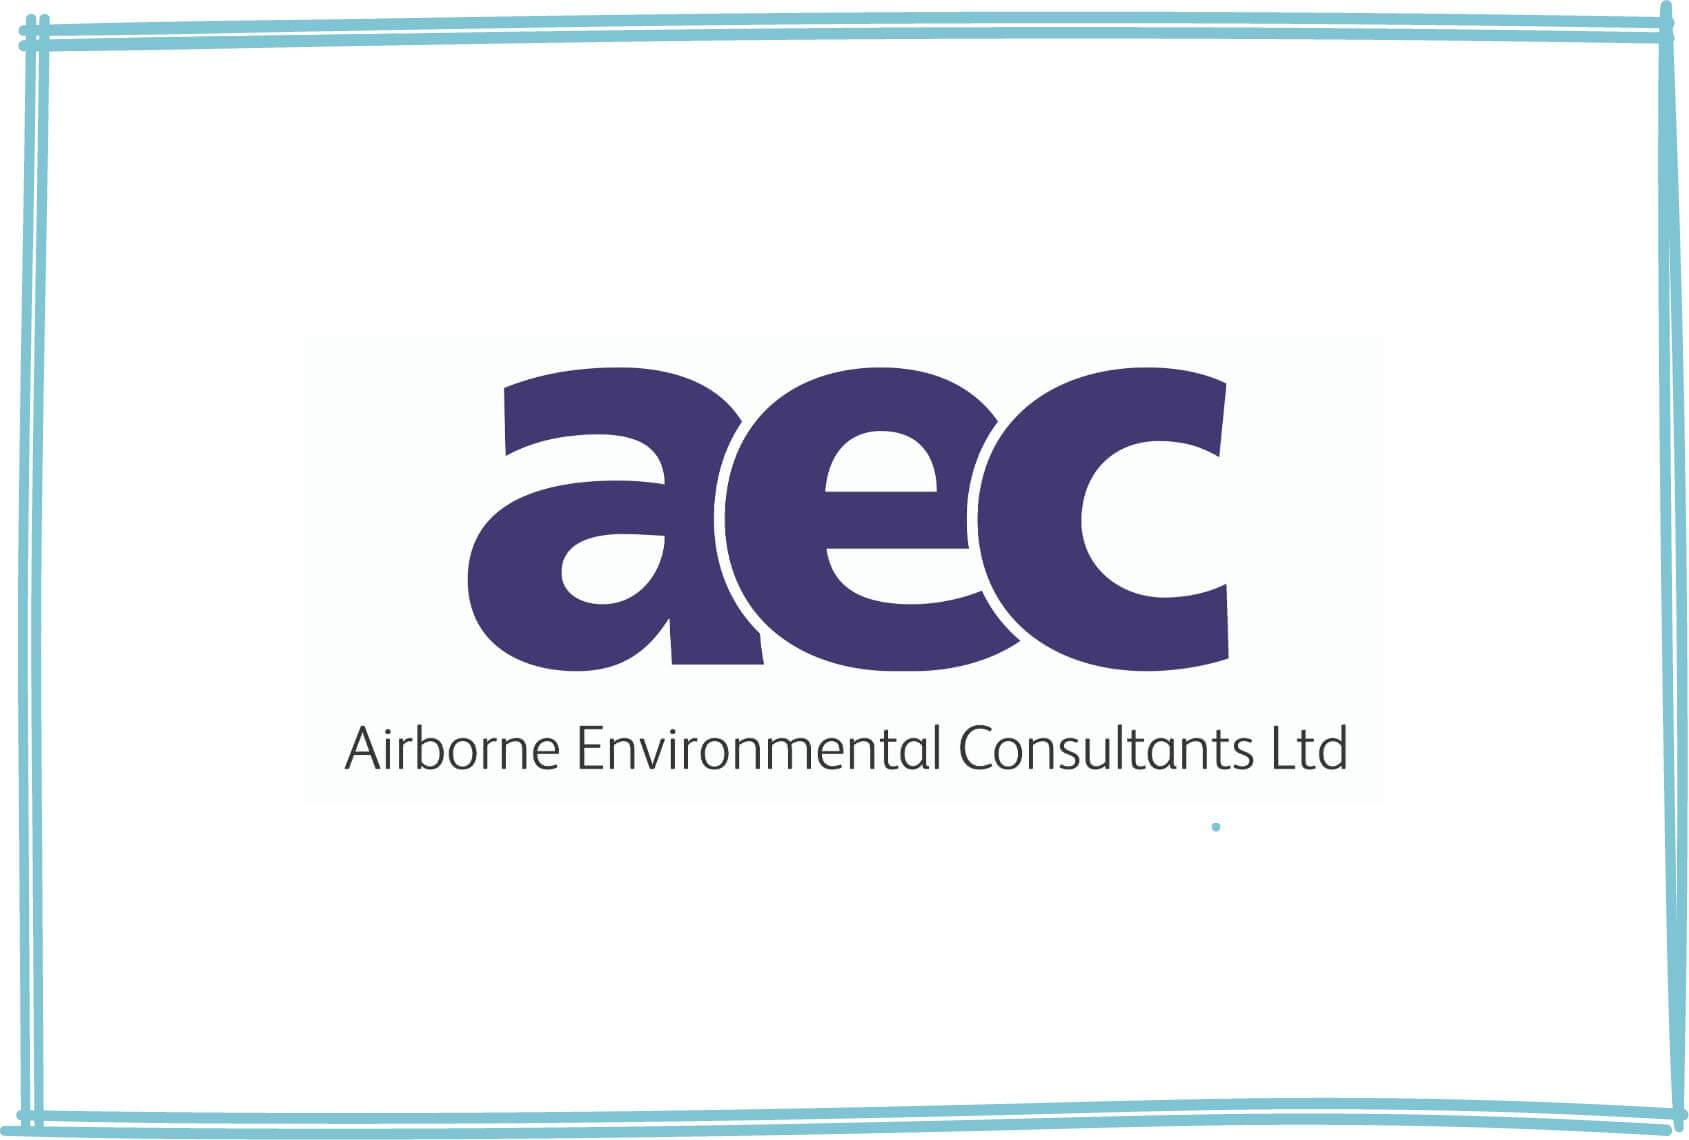 AEC environmental consultants logo